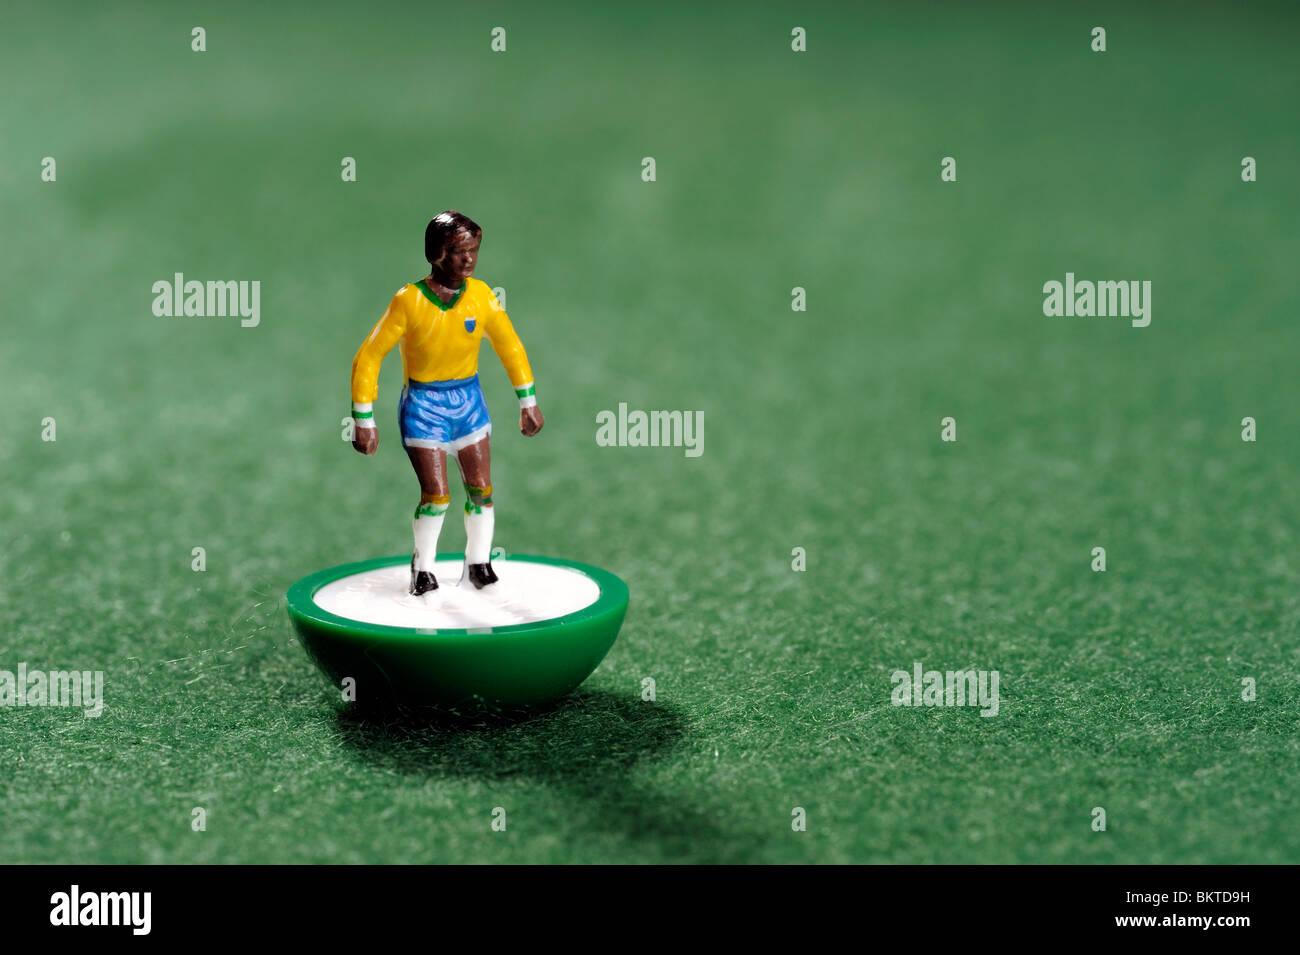 Brazil world cup subbuteo football player - Stock Image